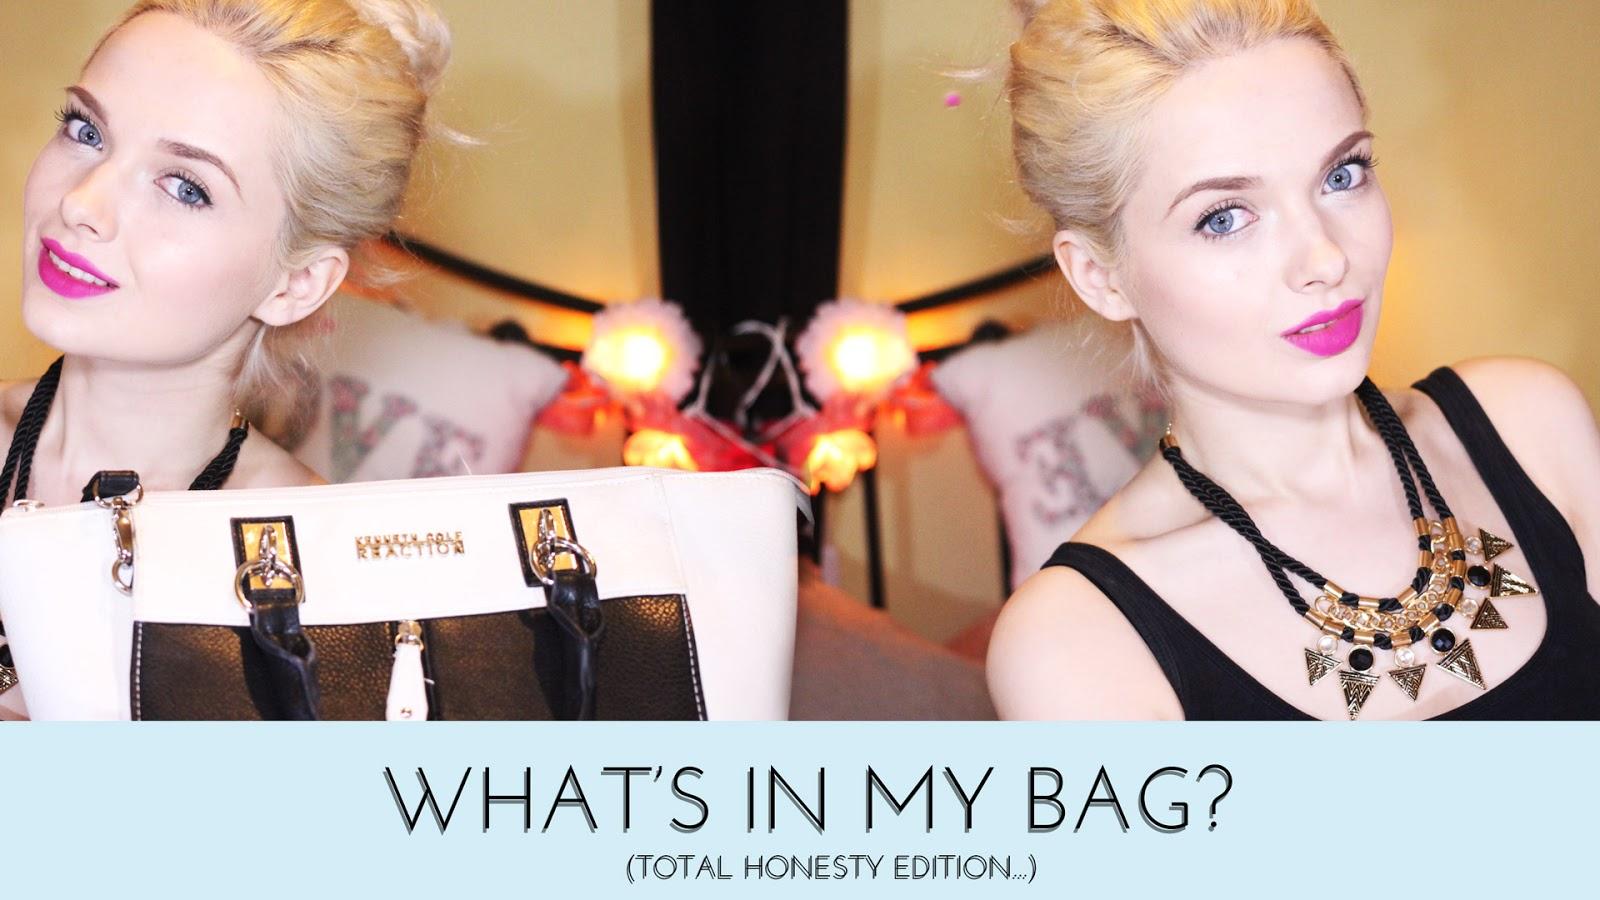 What's In My Bag, Mypaleskin, Pale Skin, Blog, VLOG